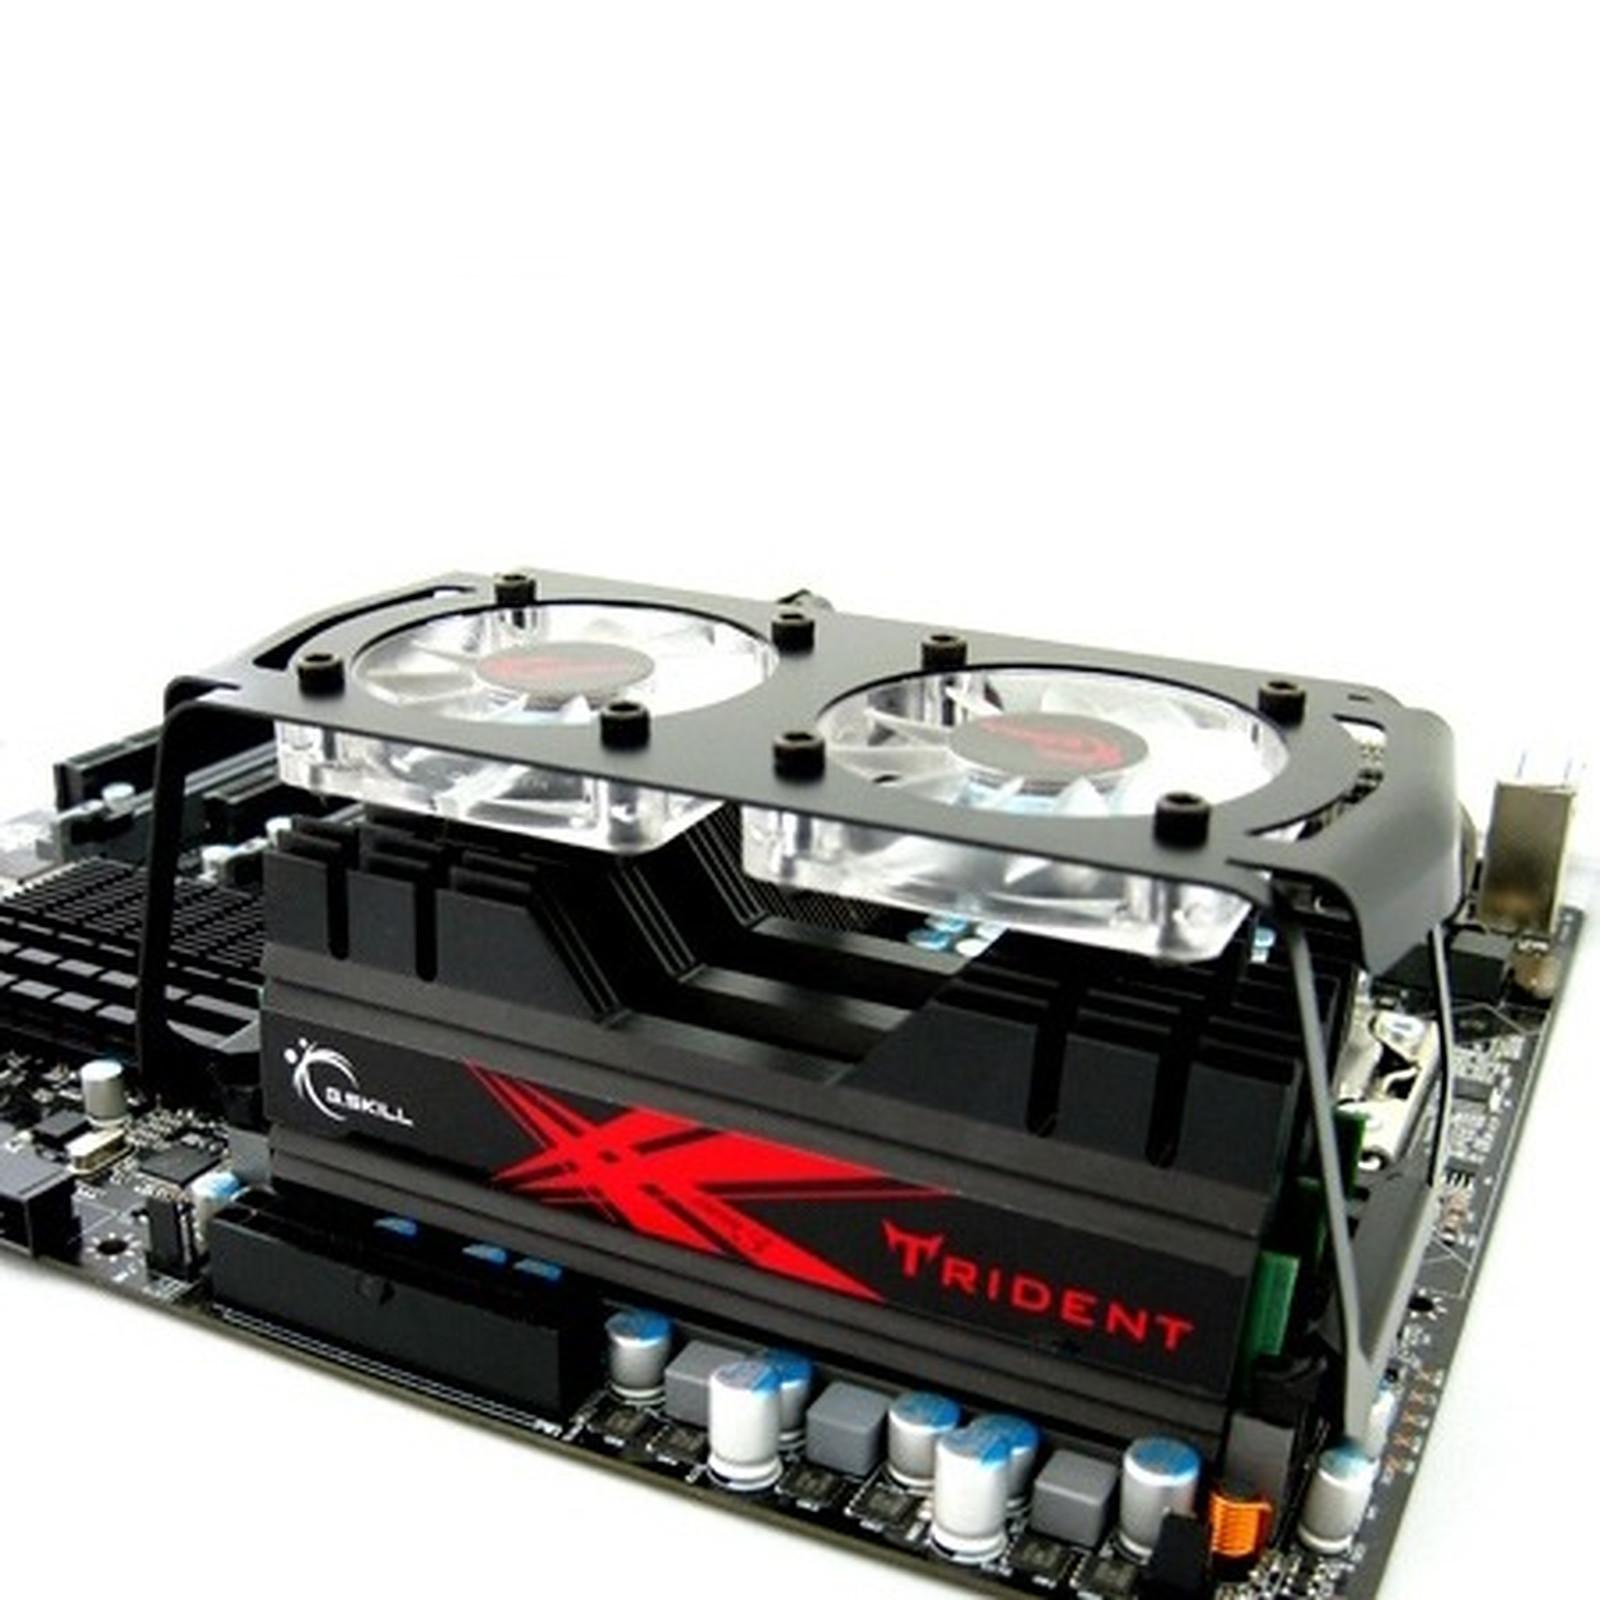 G.Skill Trident Series 6 Go (3x 2Go) DDR3 2000 MHz